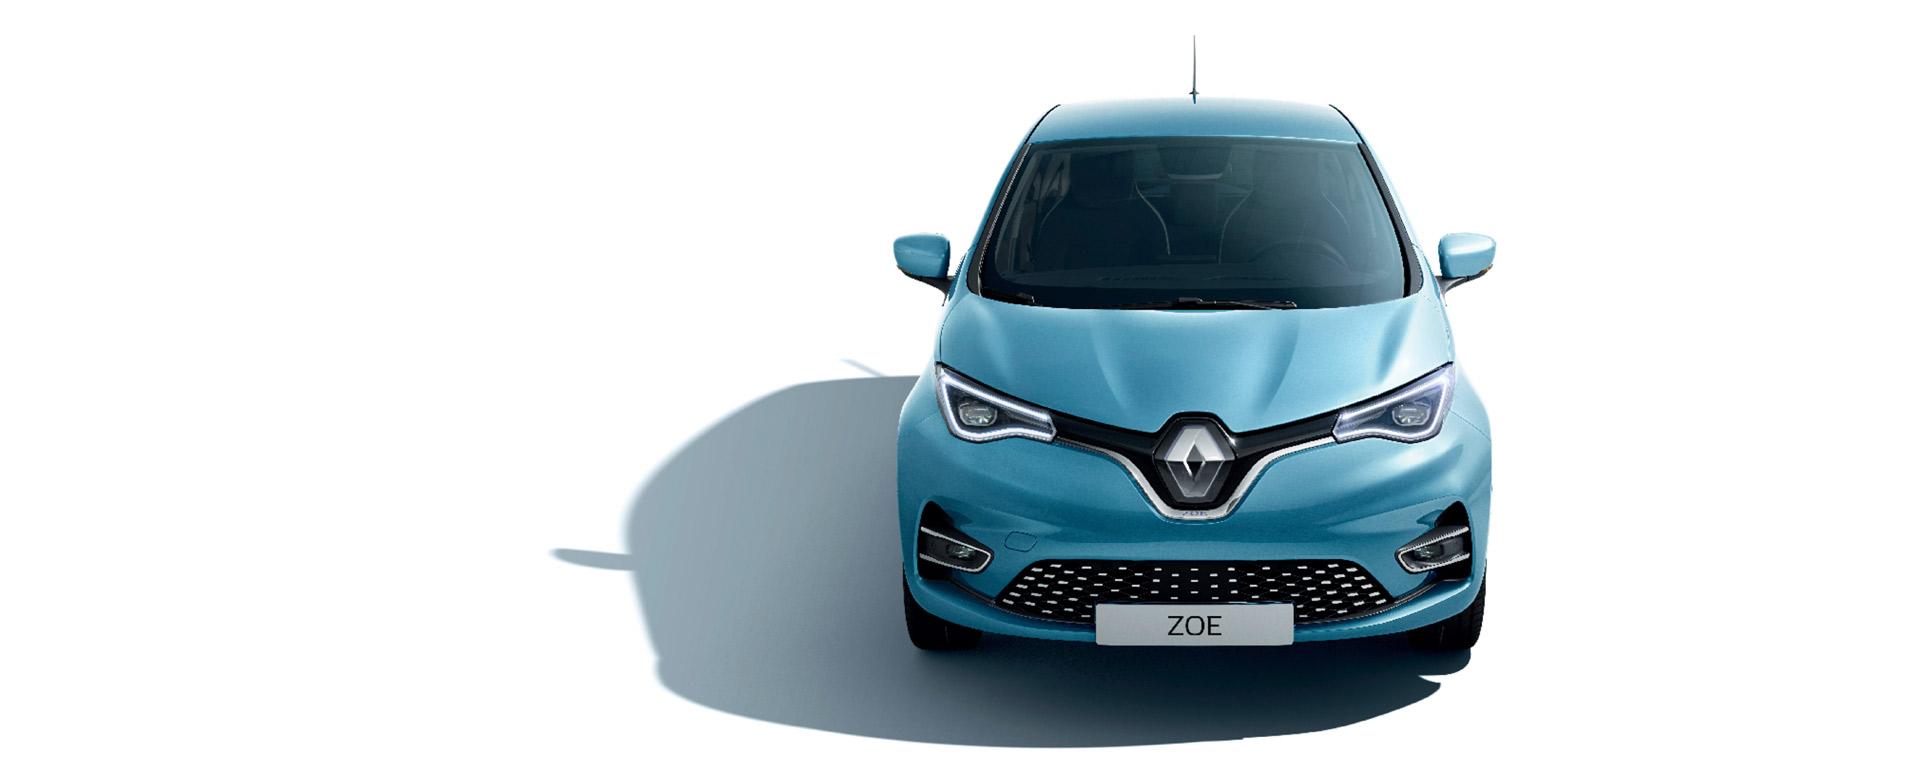 Renault legt vor